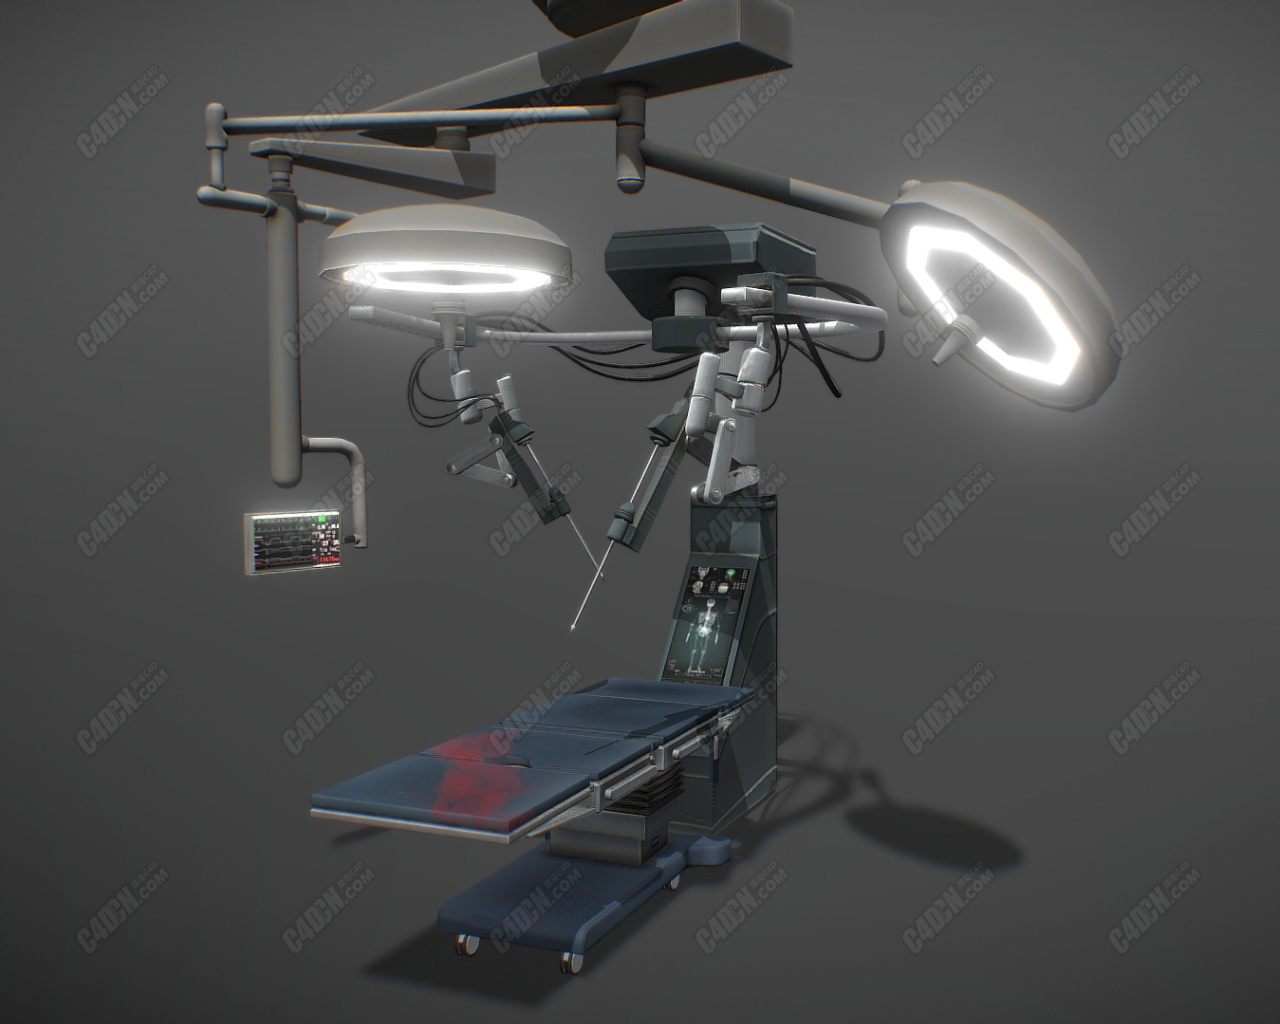 C4D精密仪器医院手术台医疗器械模型